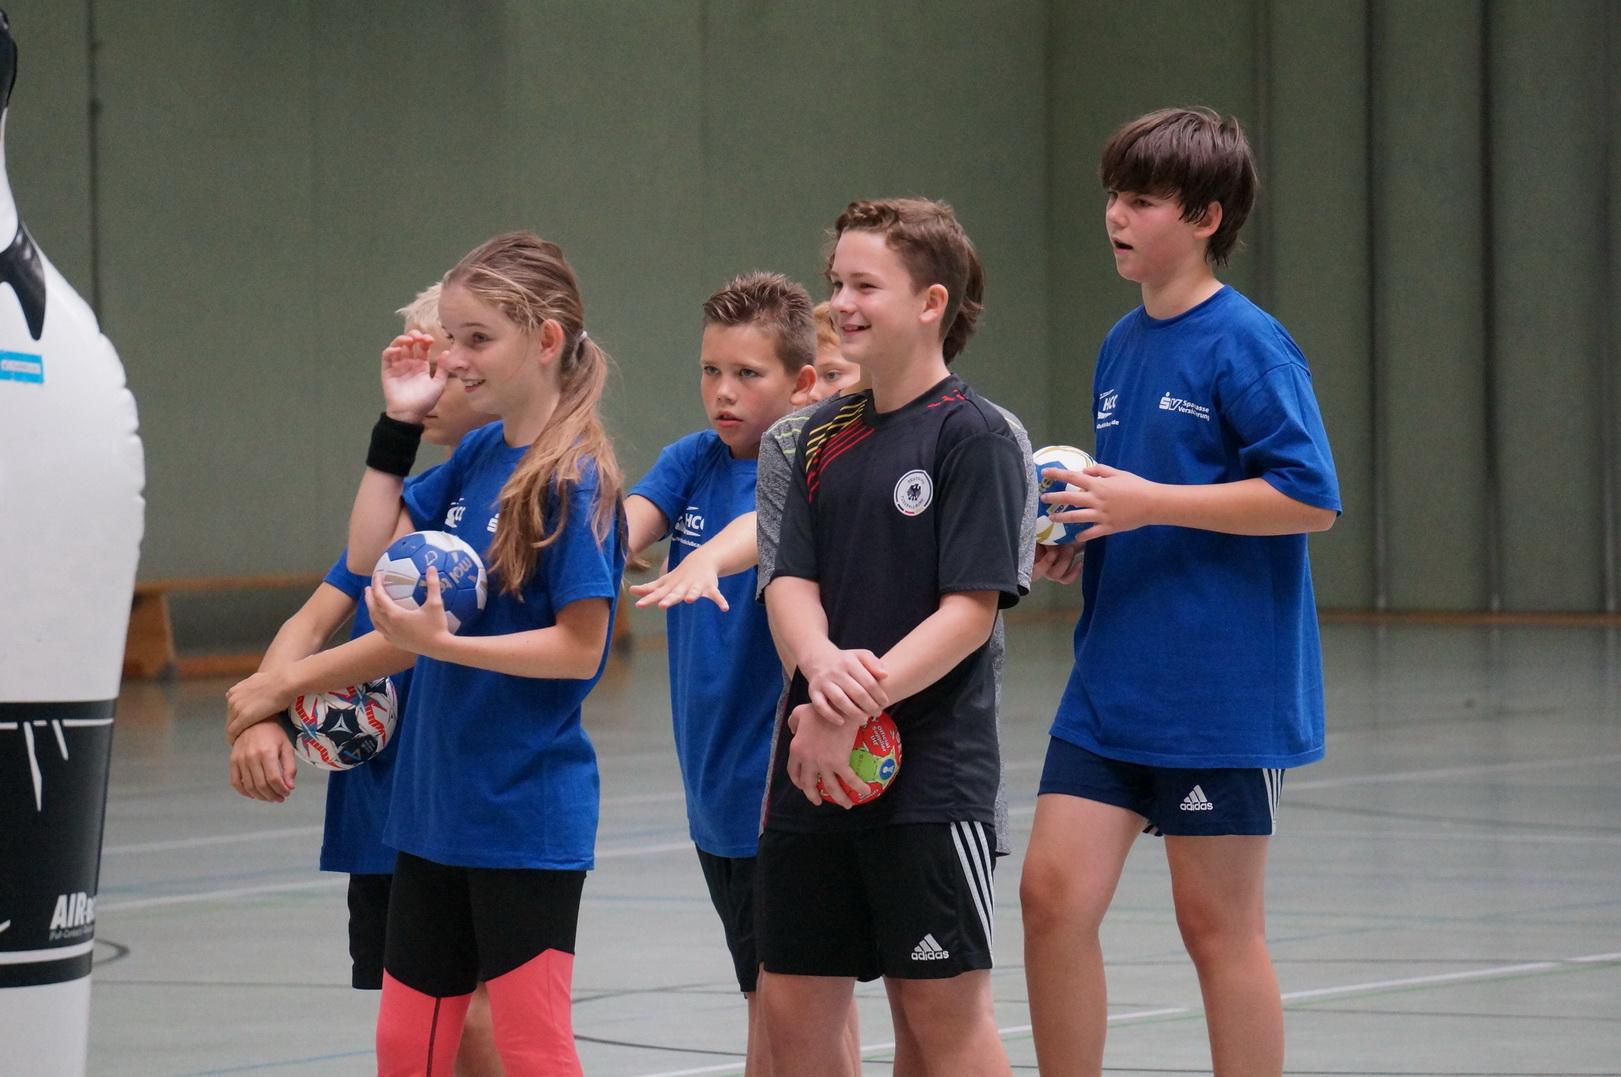 201808_Handballcamp_SDH_MG_205w